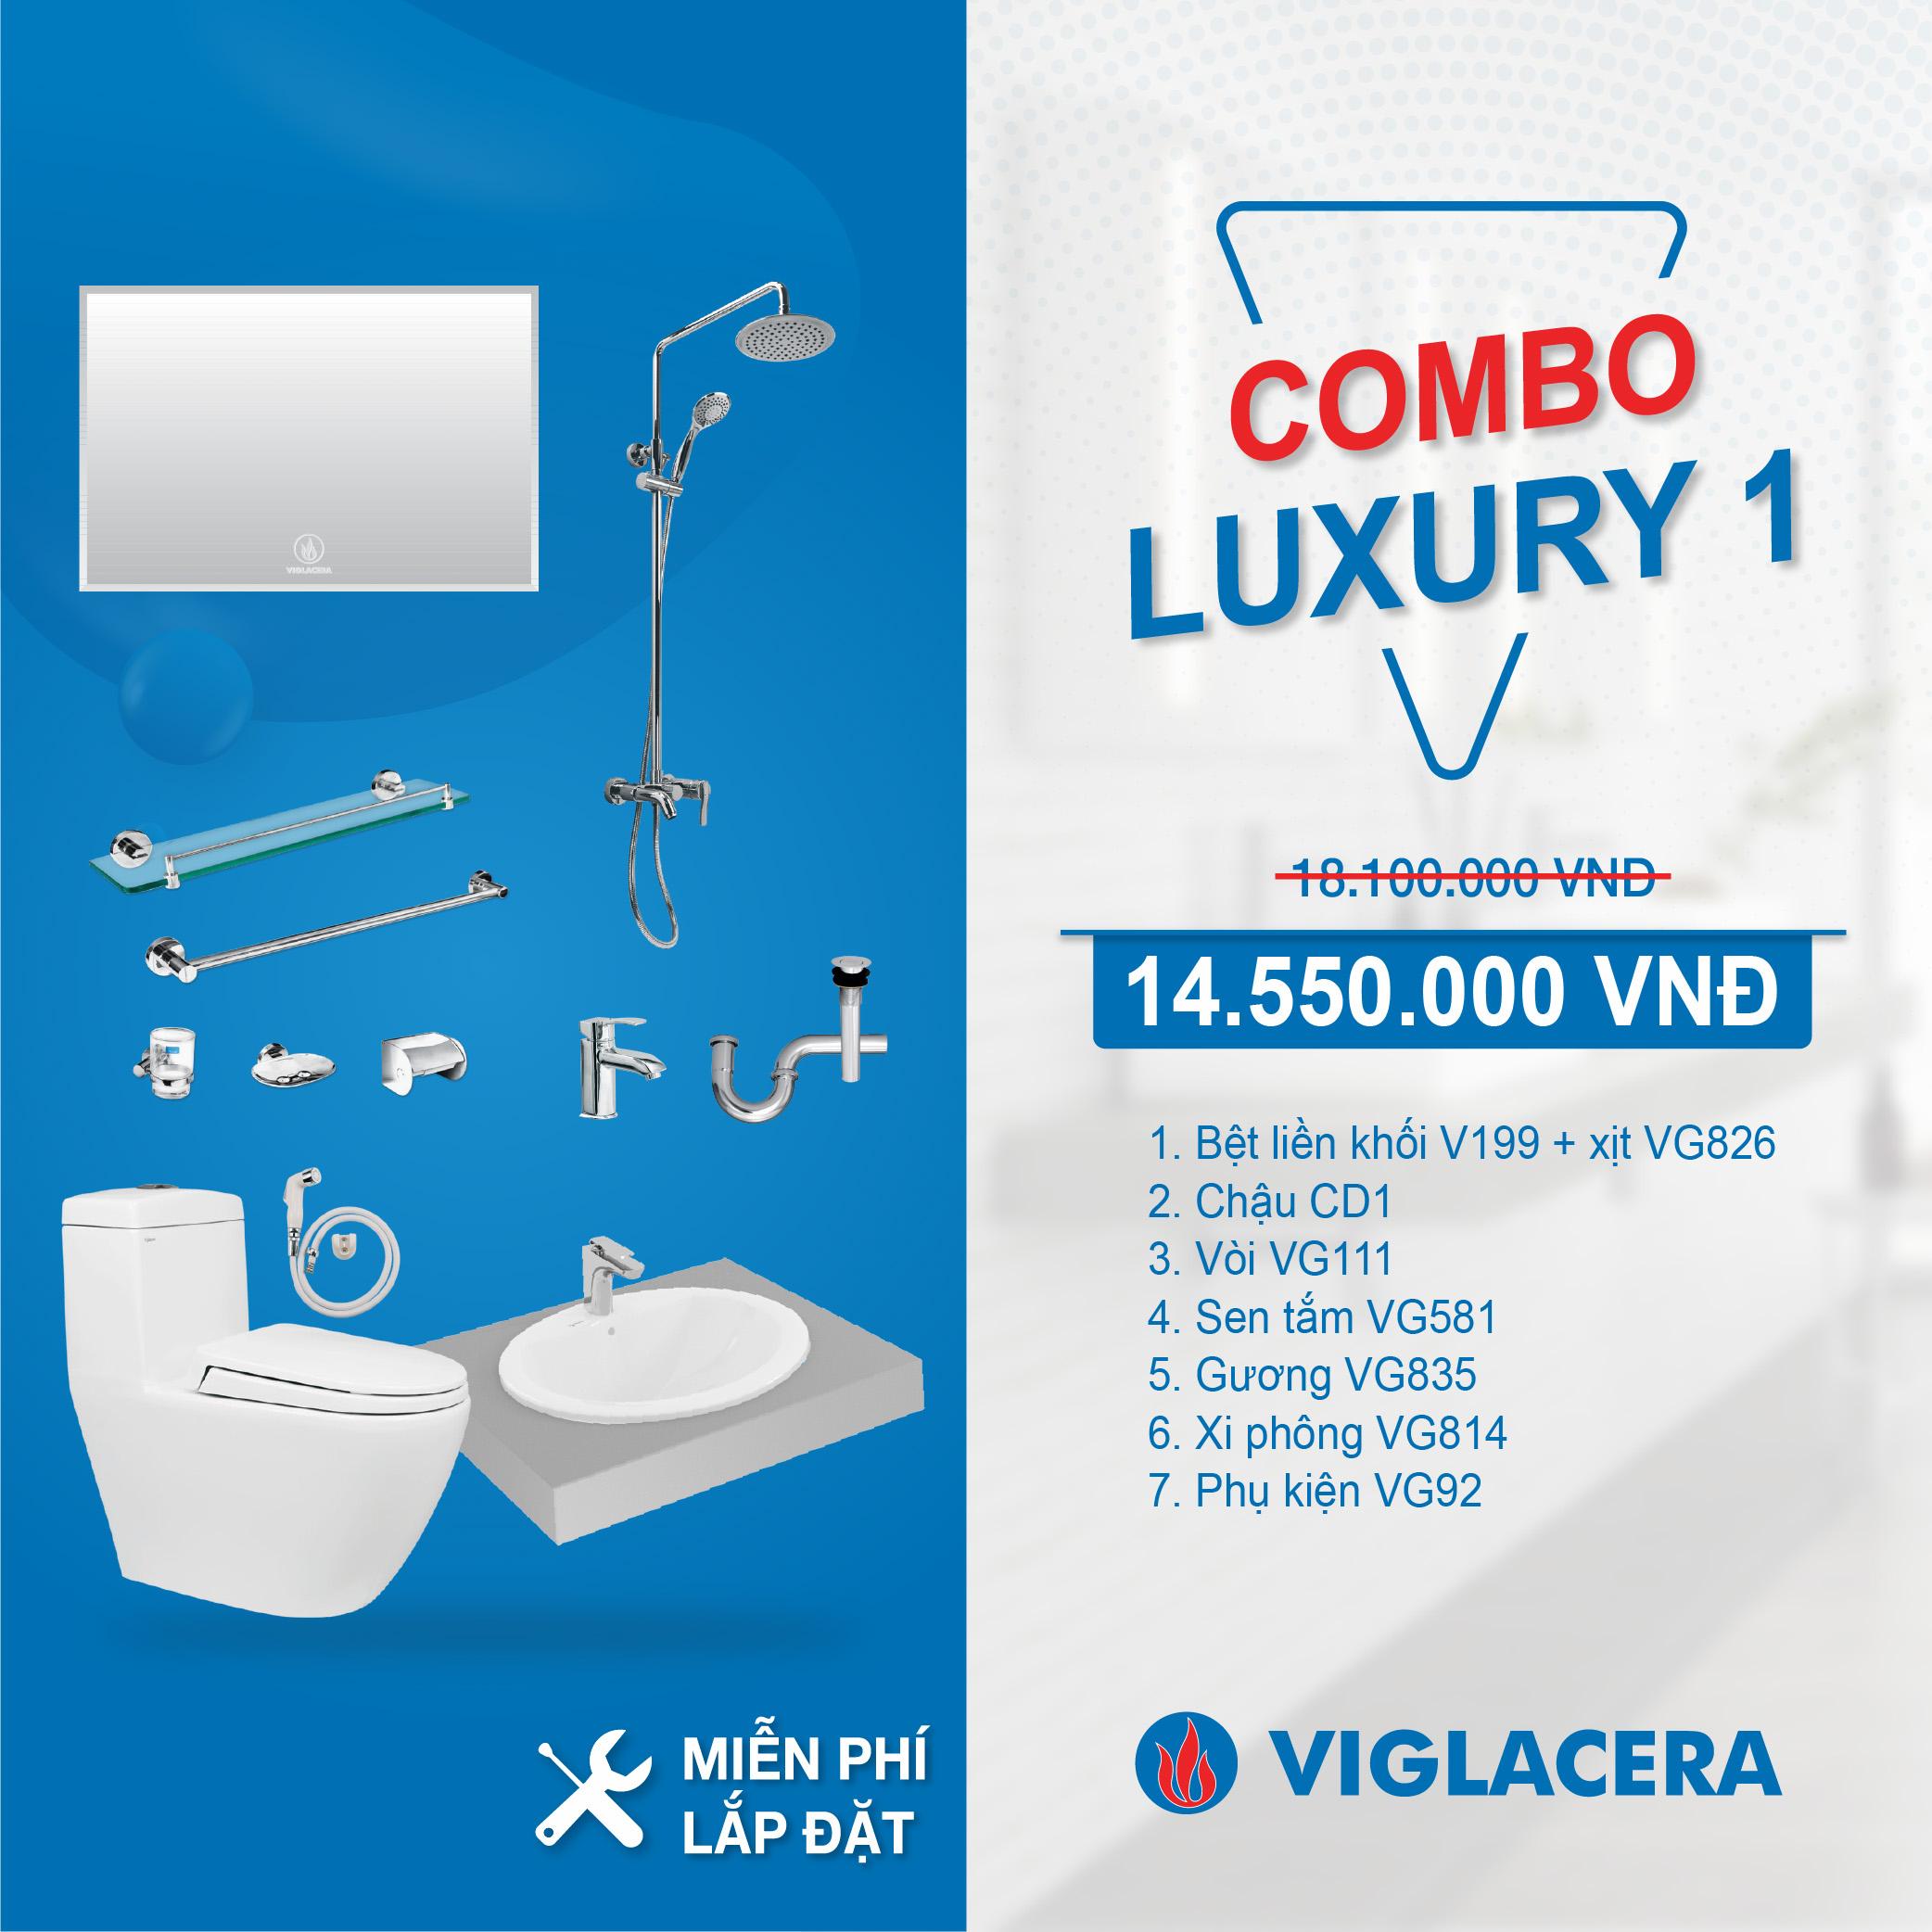 Combo Viglacera Luxury 1